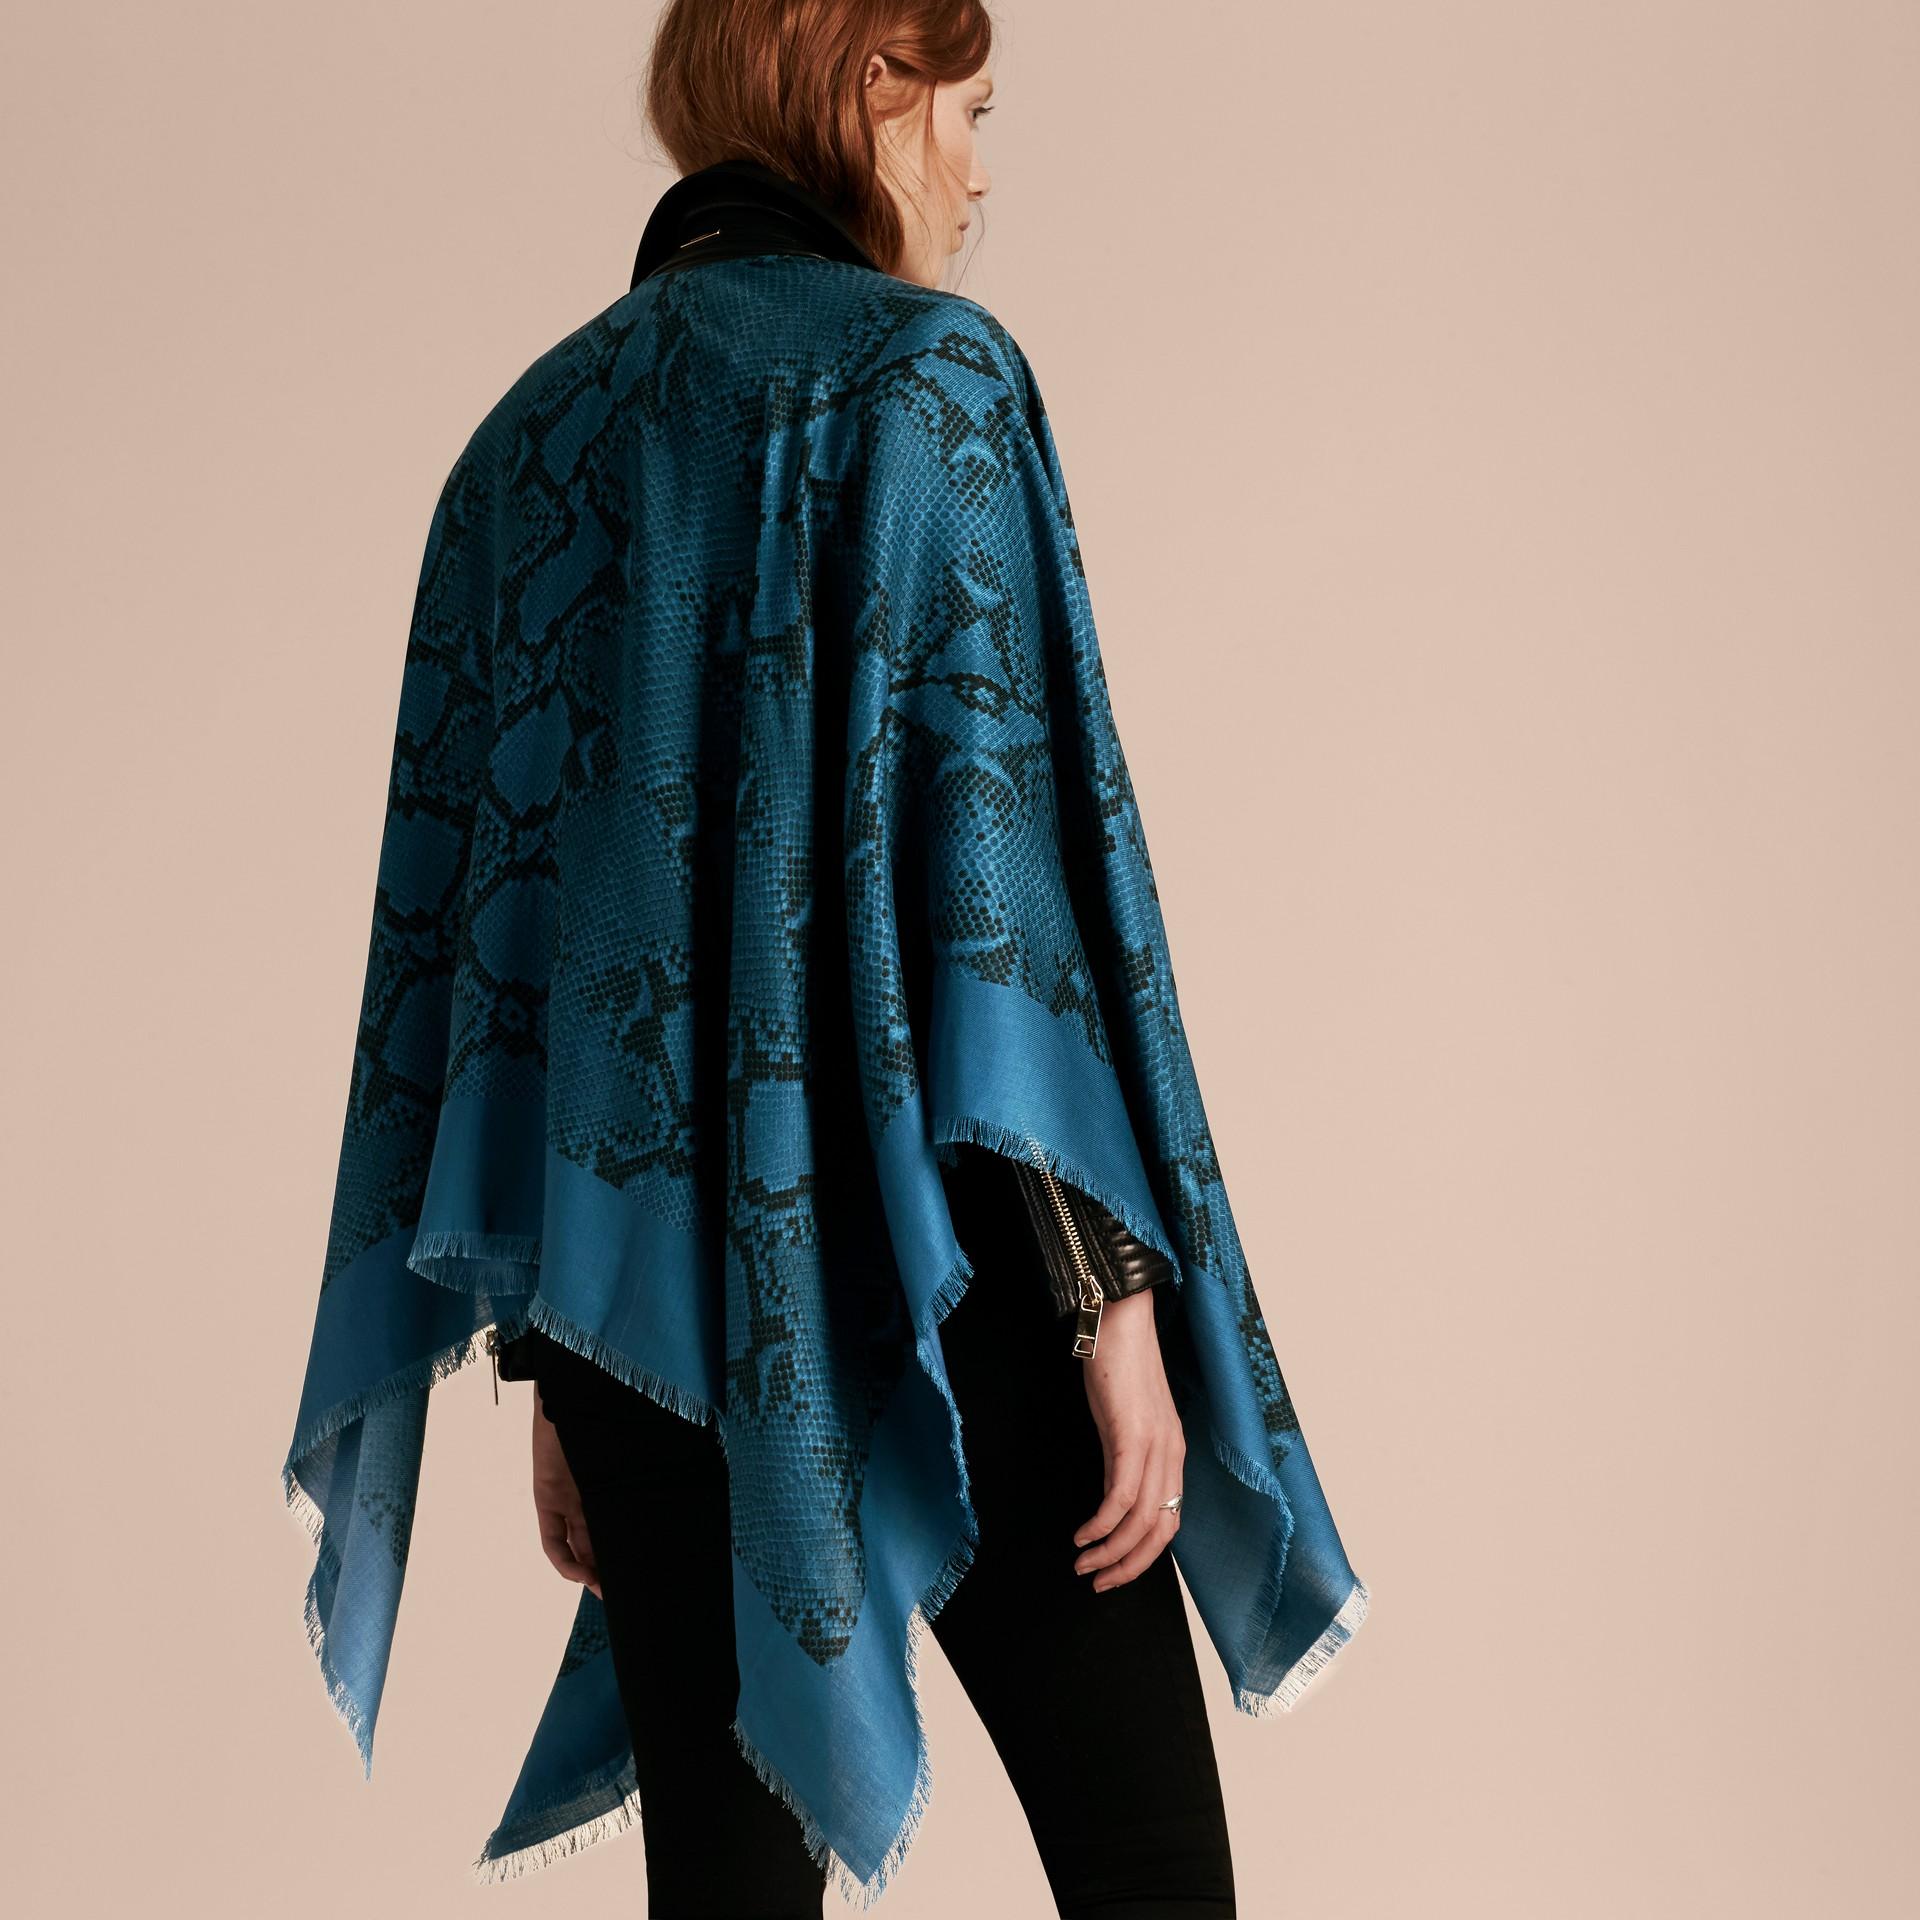 Mineral blue Poncho leve de lã, seda e cashmere com estampa de píton Mineral Blue - galeria de imagens 6